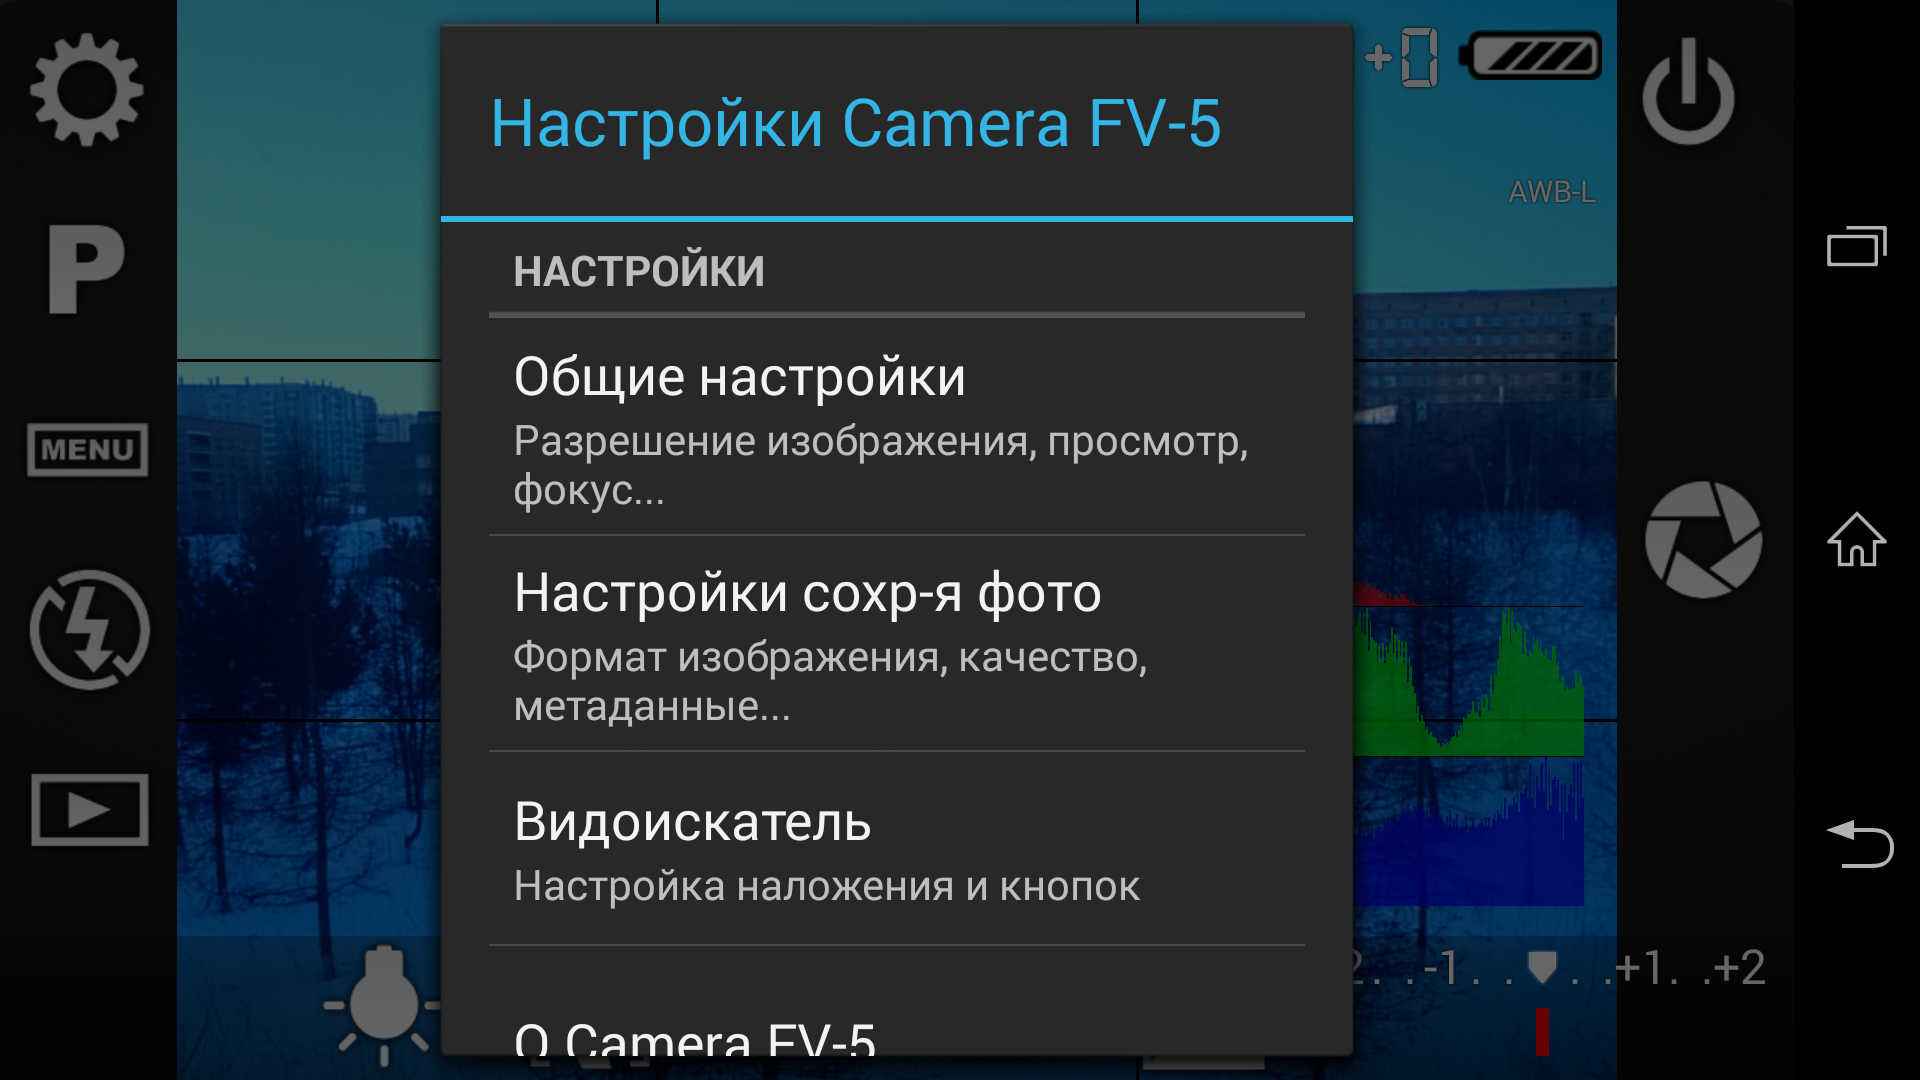 Параметры камеры на телефоне для качественных фото